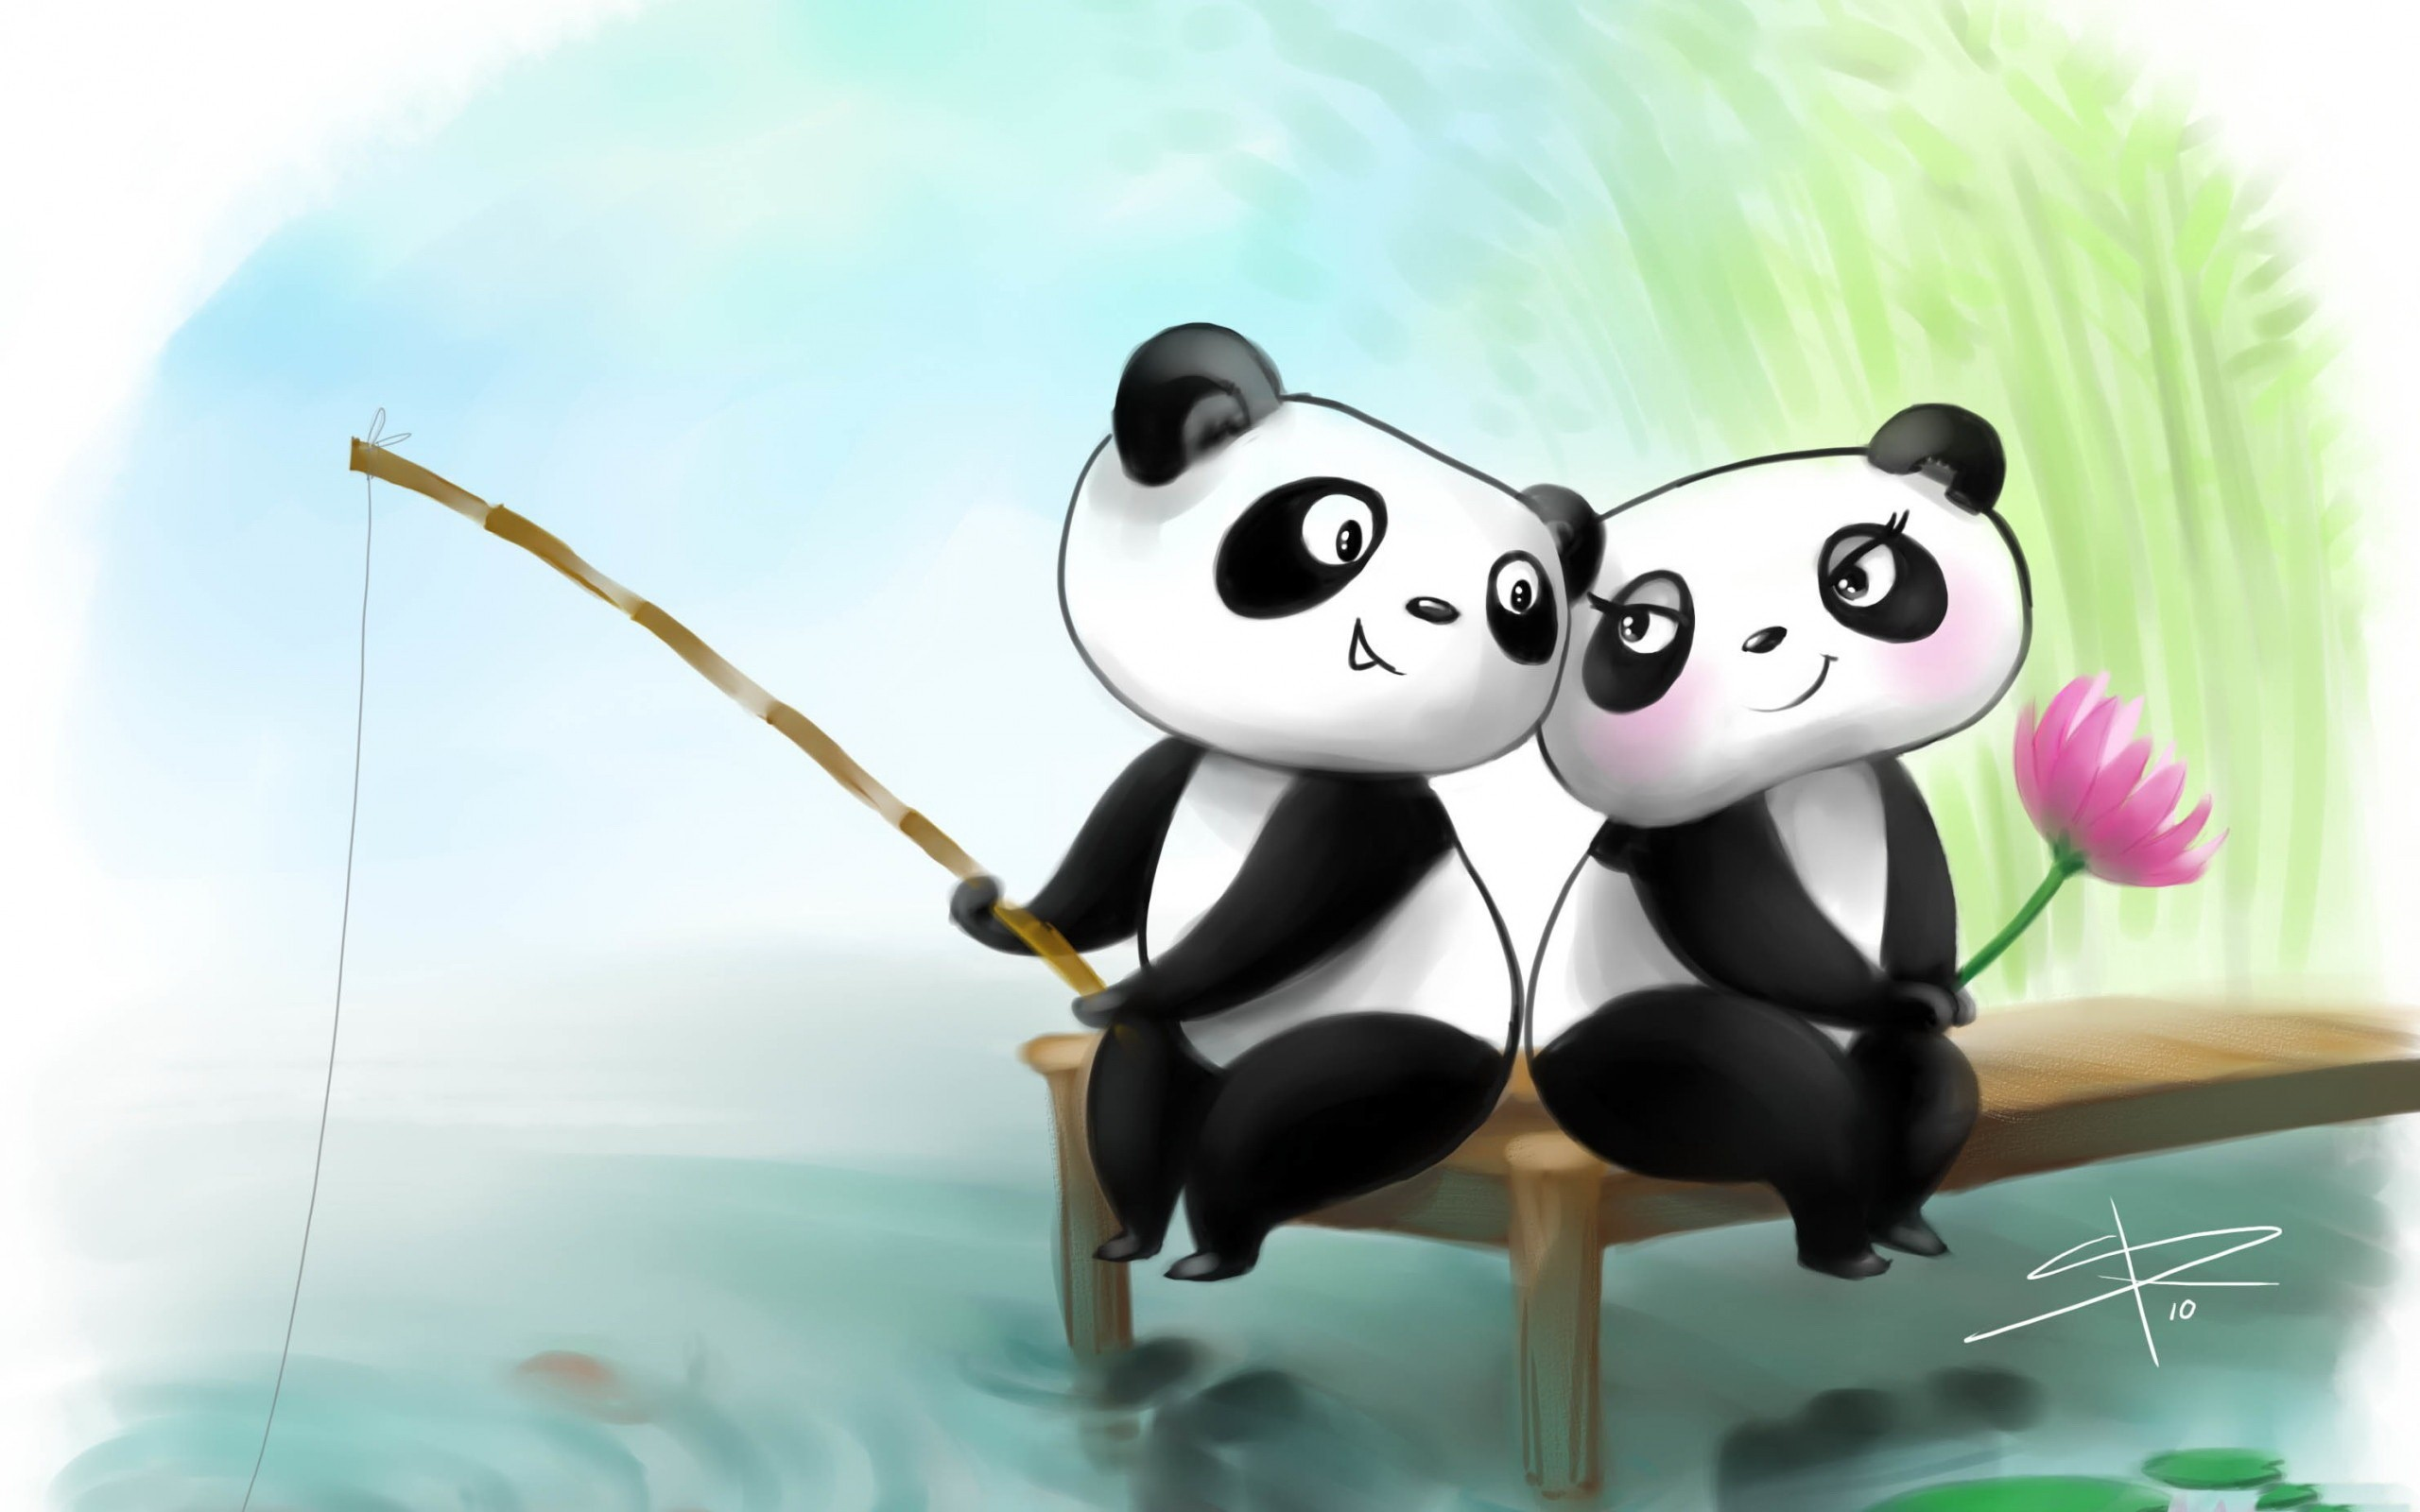 <b>Cute Panda Wallpaper</b> – WallpaperSafari